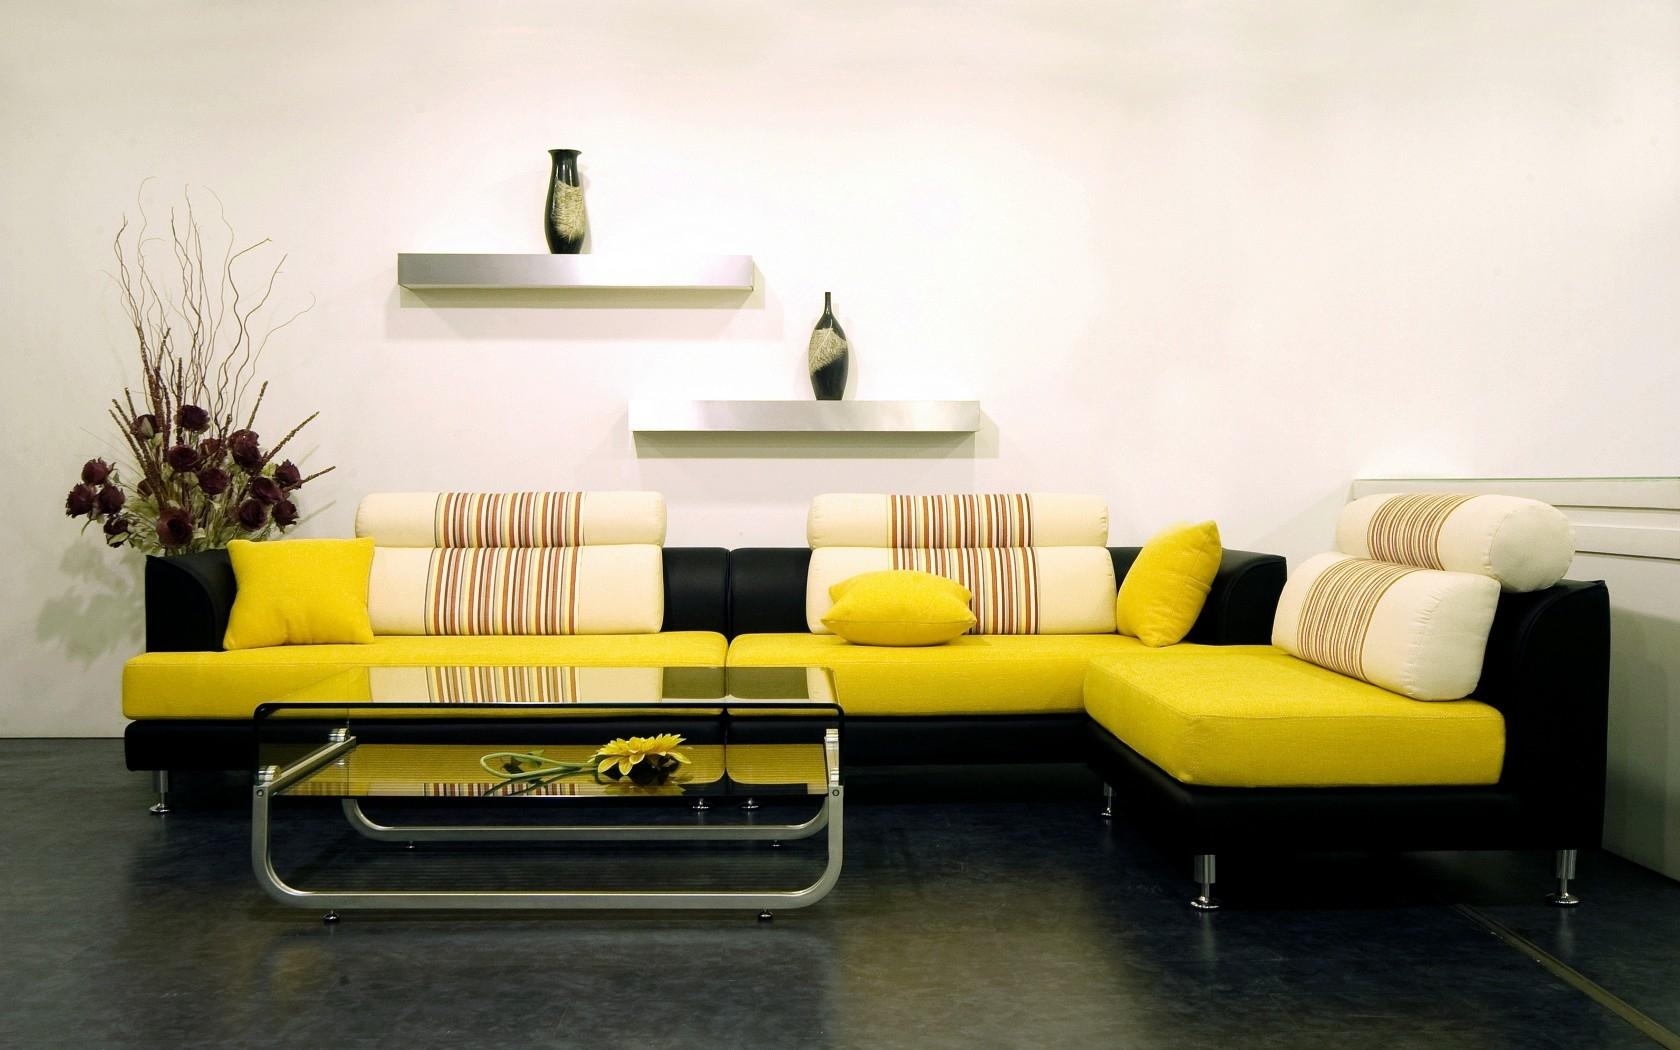 Wallpaper Flowers Table Yellow Interior Design Sofa